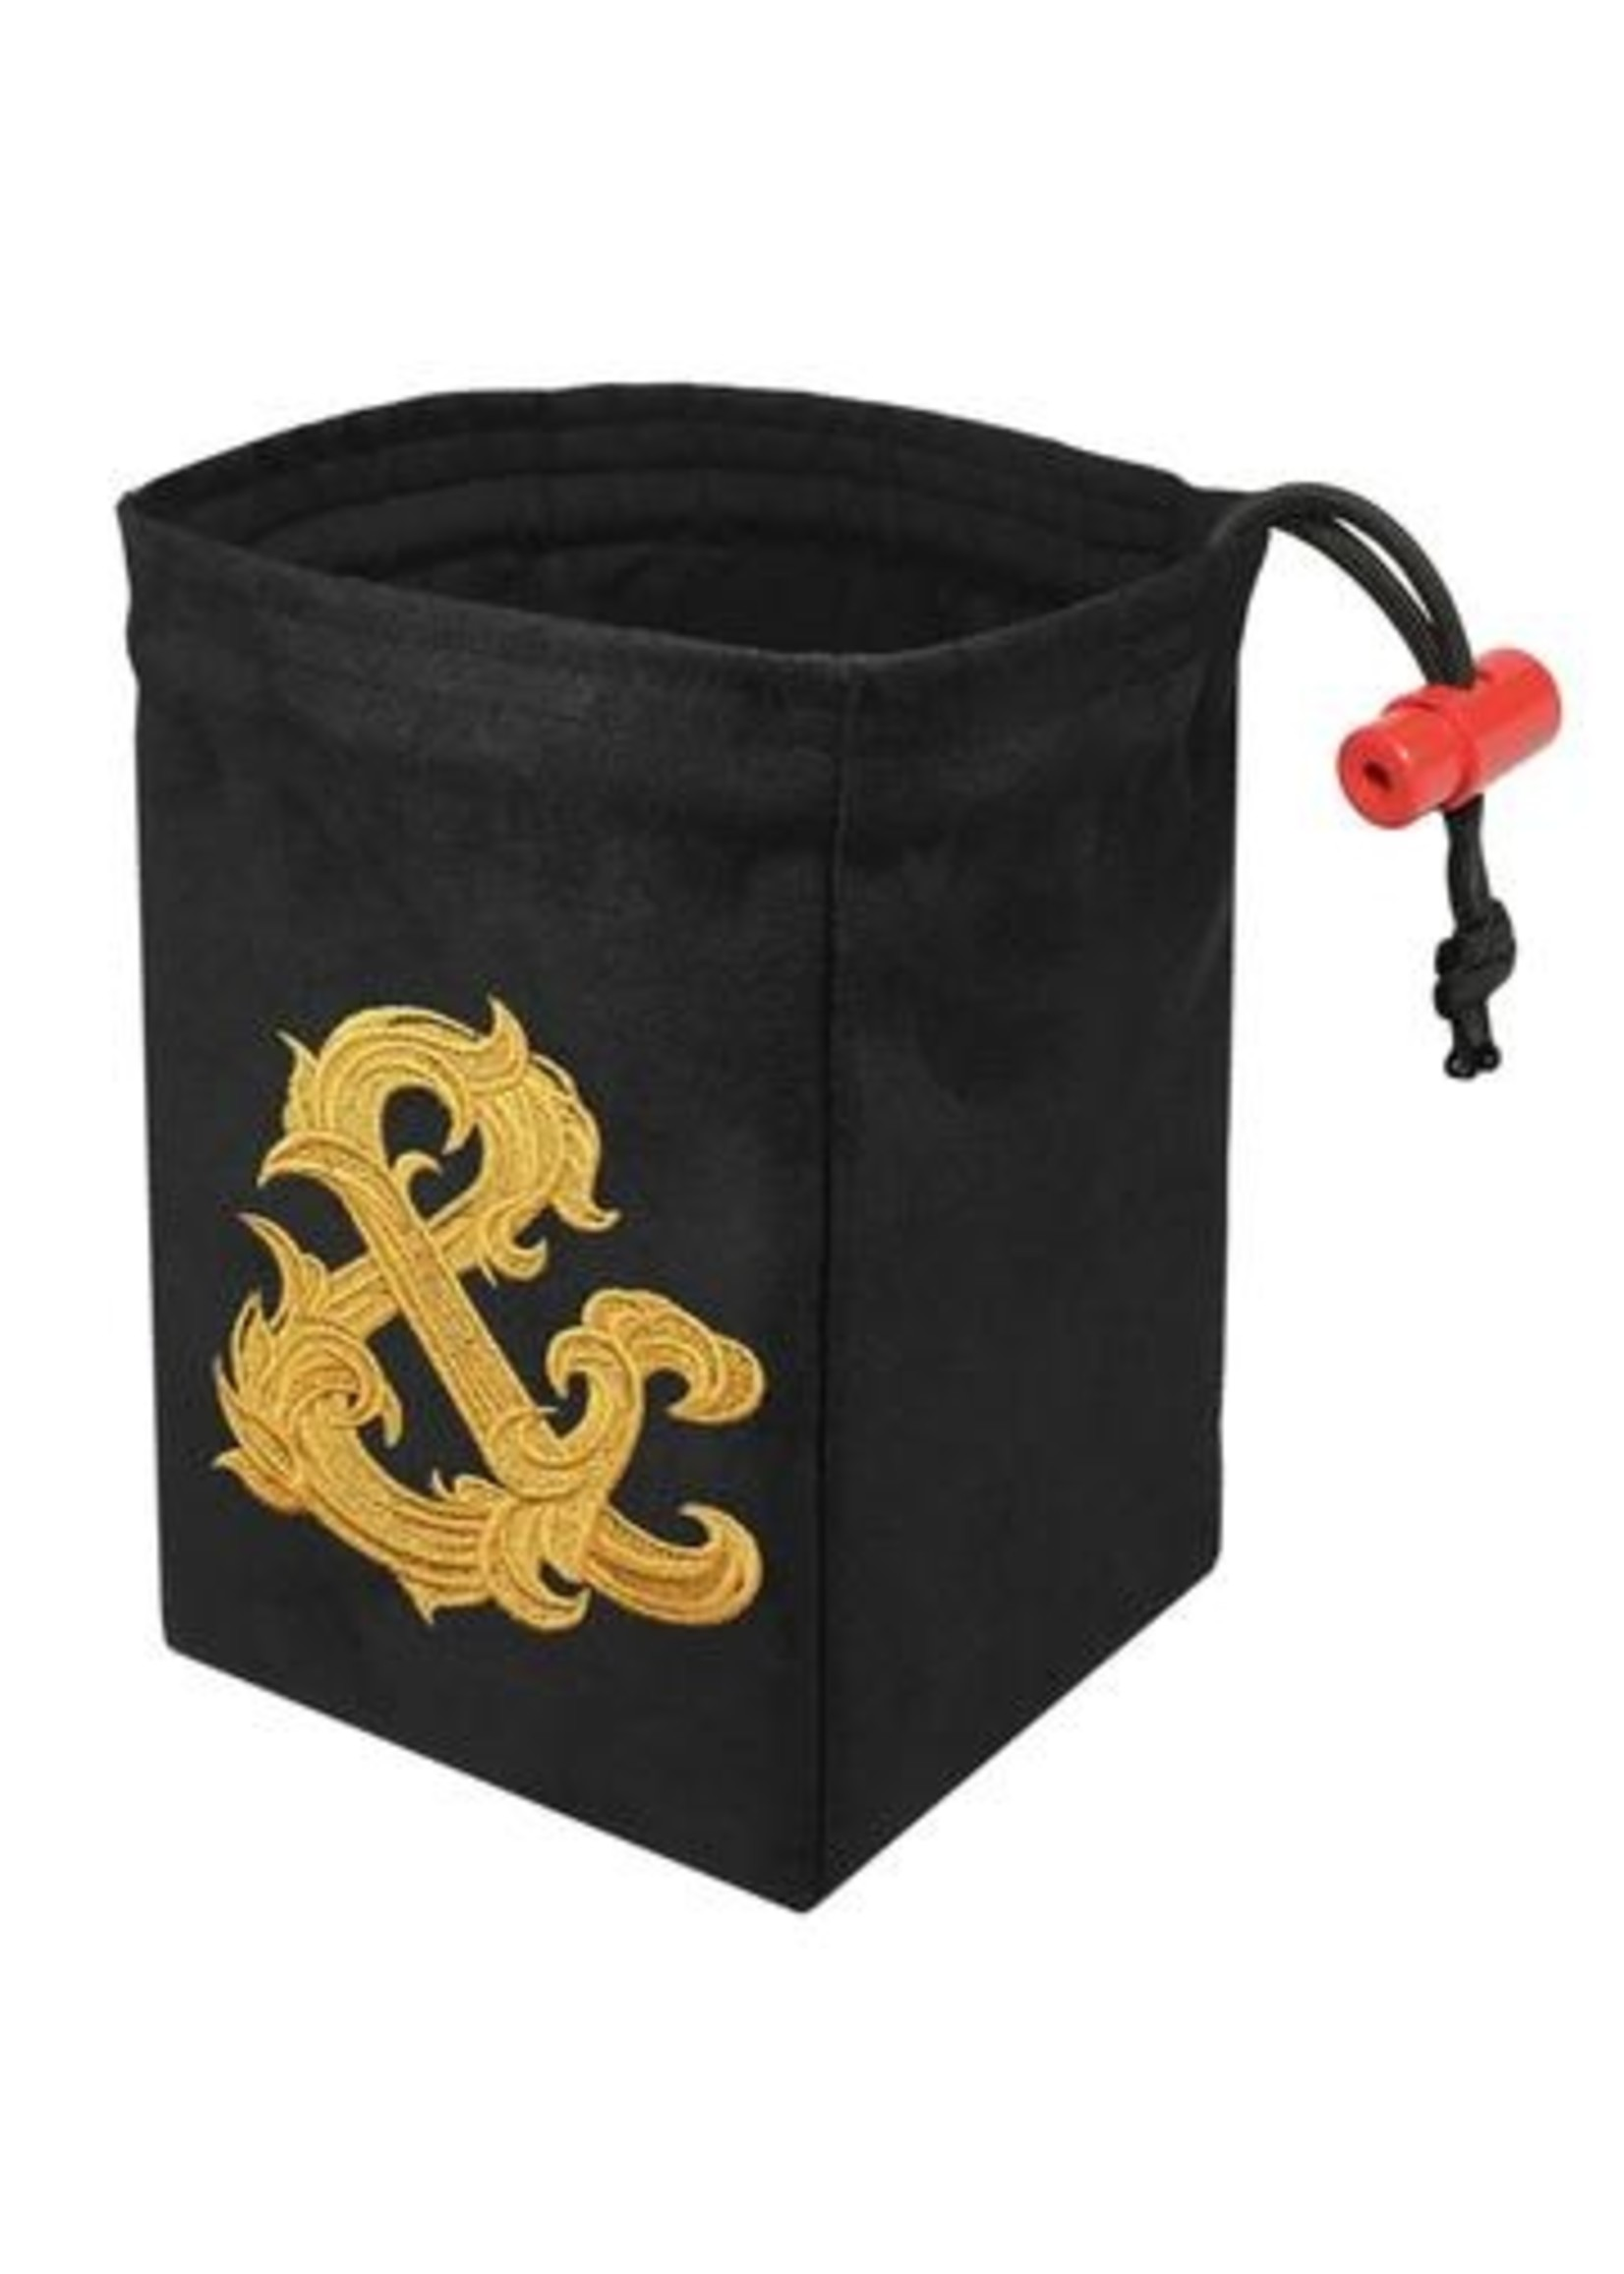 Embroidered Dice Bag: Gilded Ampersand